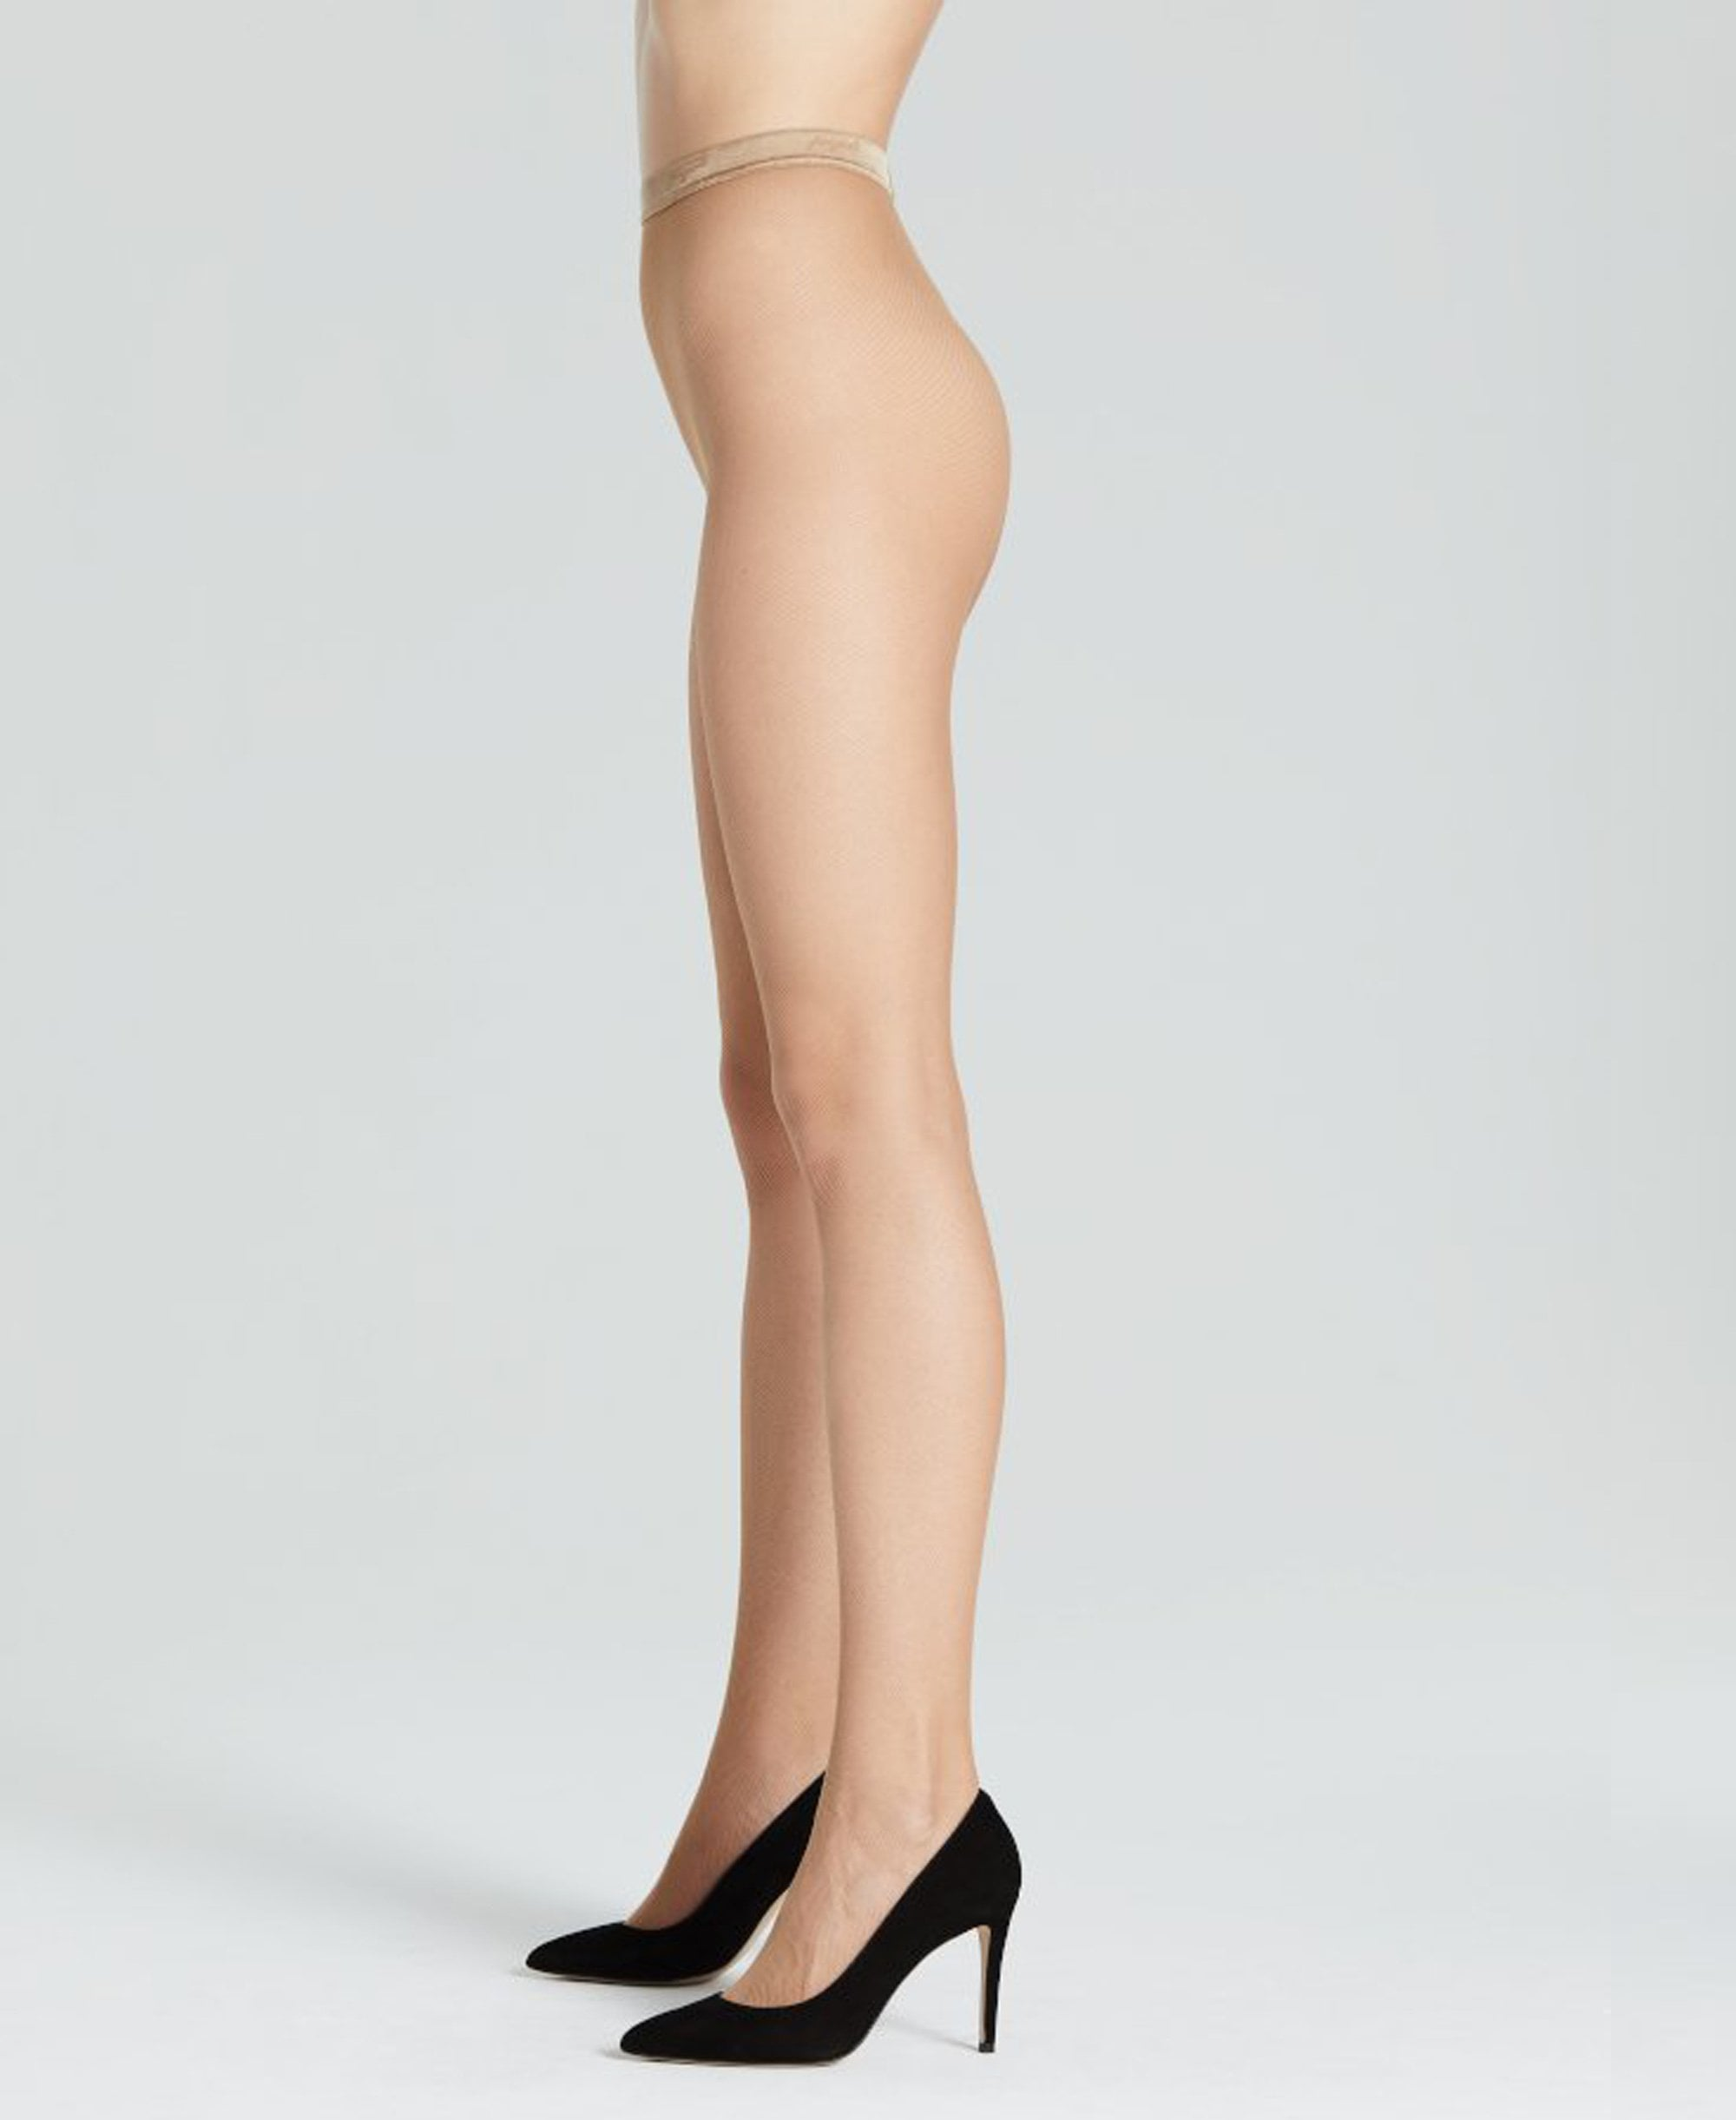 Seamless tights